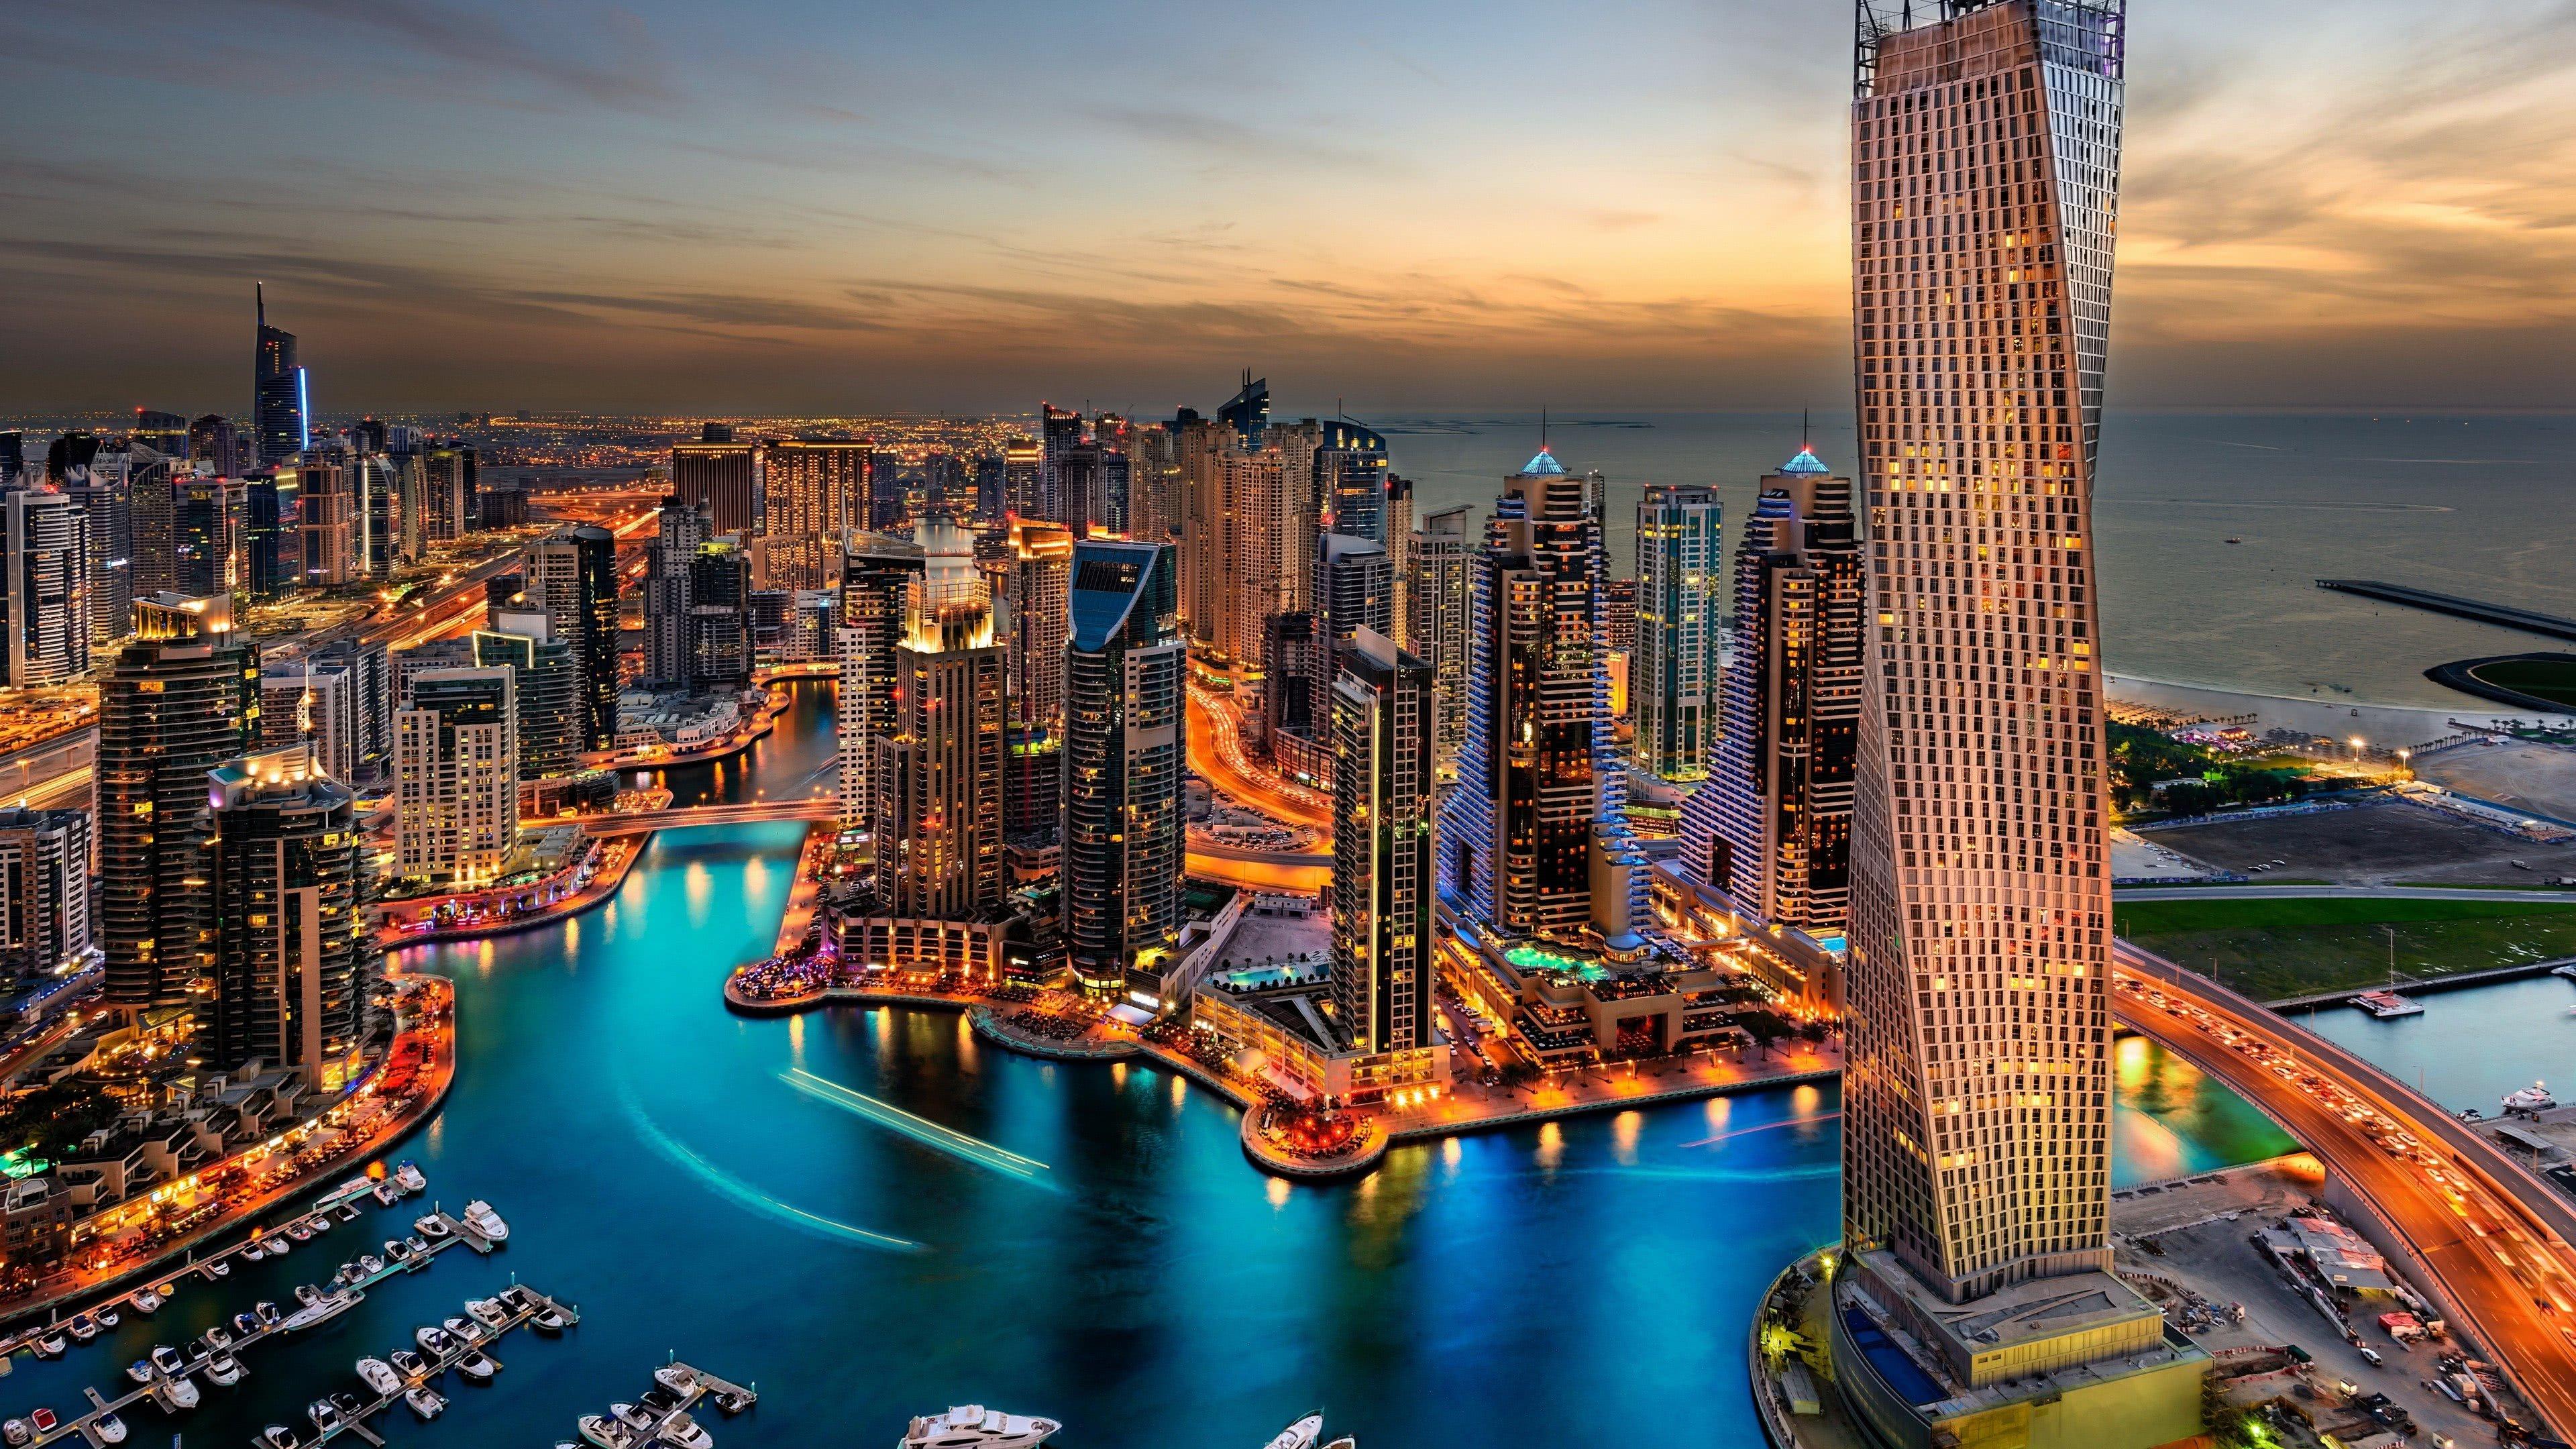 Dubai Skyscrapers United Arab Emirates UHD 4K Wallpaper Pixelz 3840x2160